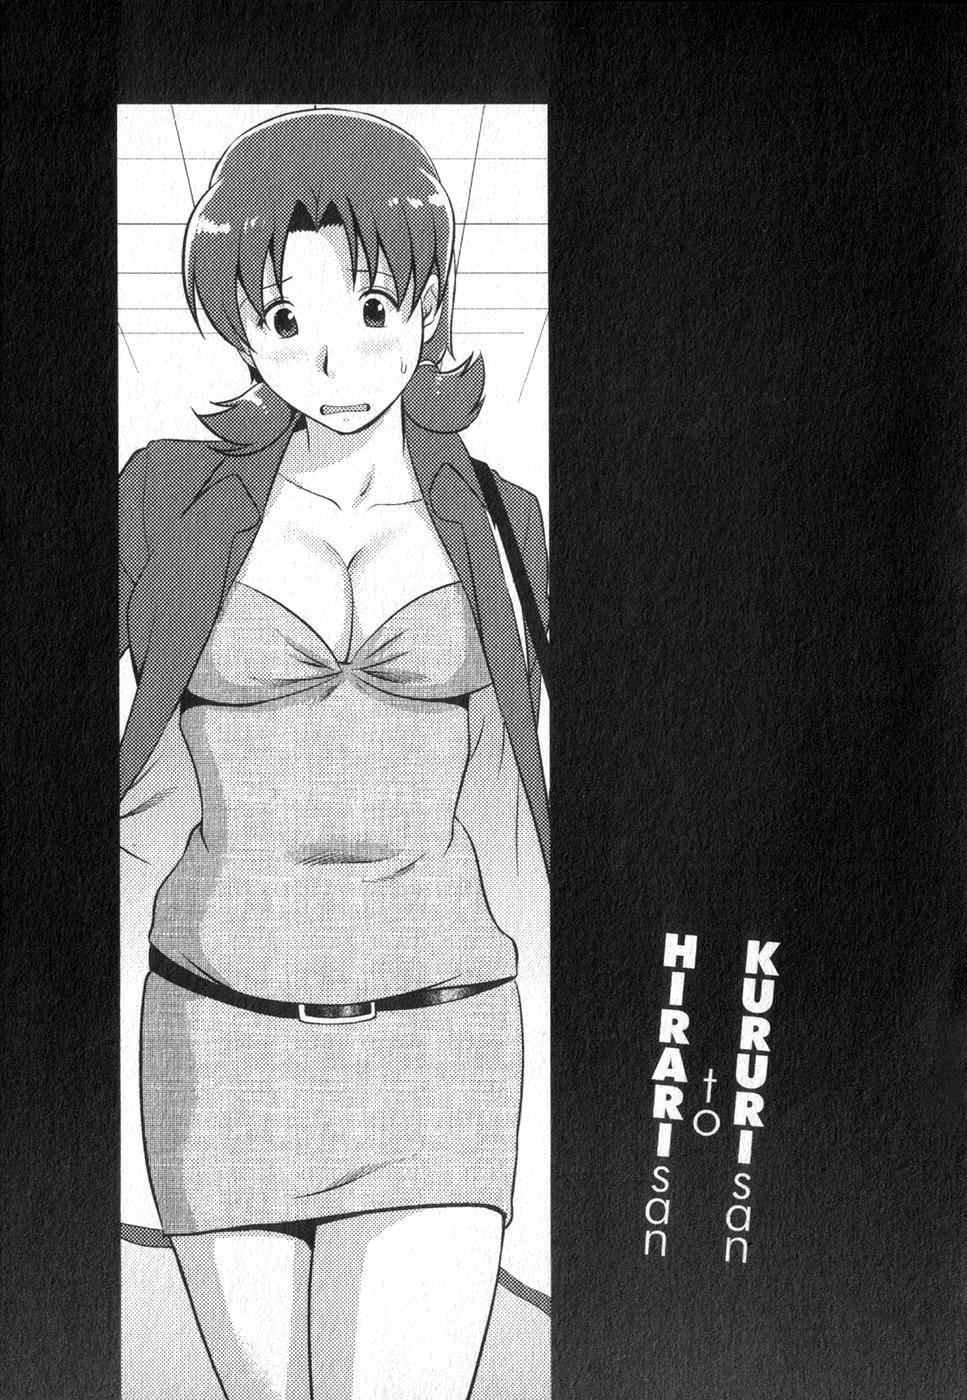 [Saigado] Kururi-san to Hirari-san Vol. 1 (Complete) 85